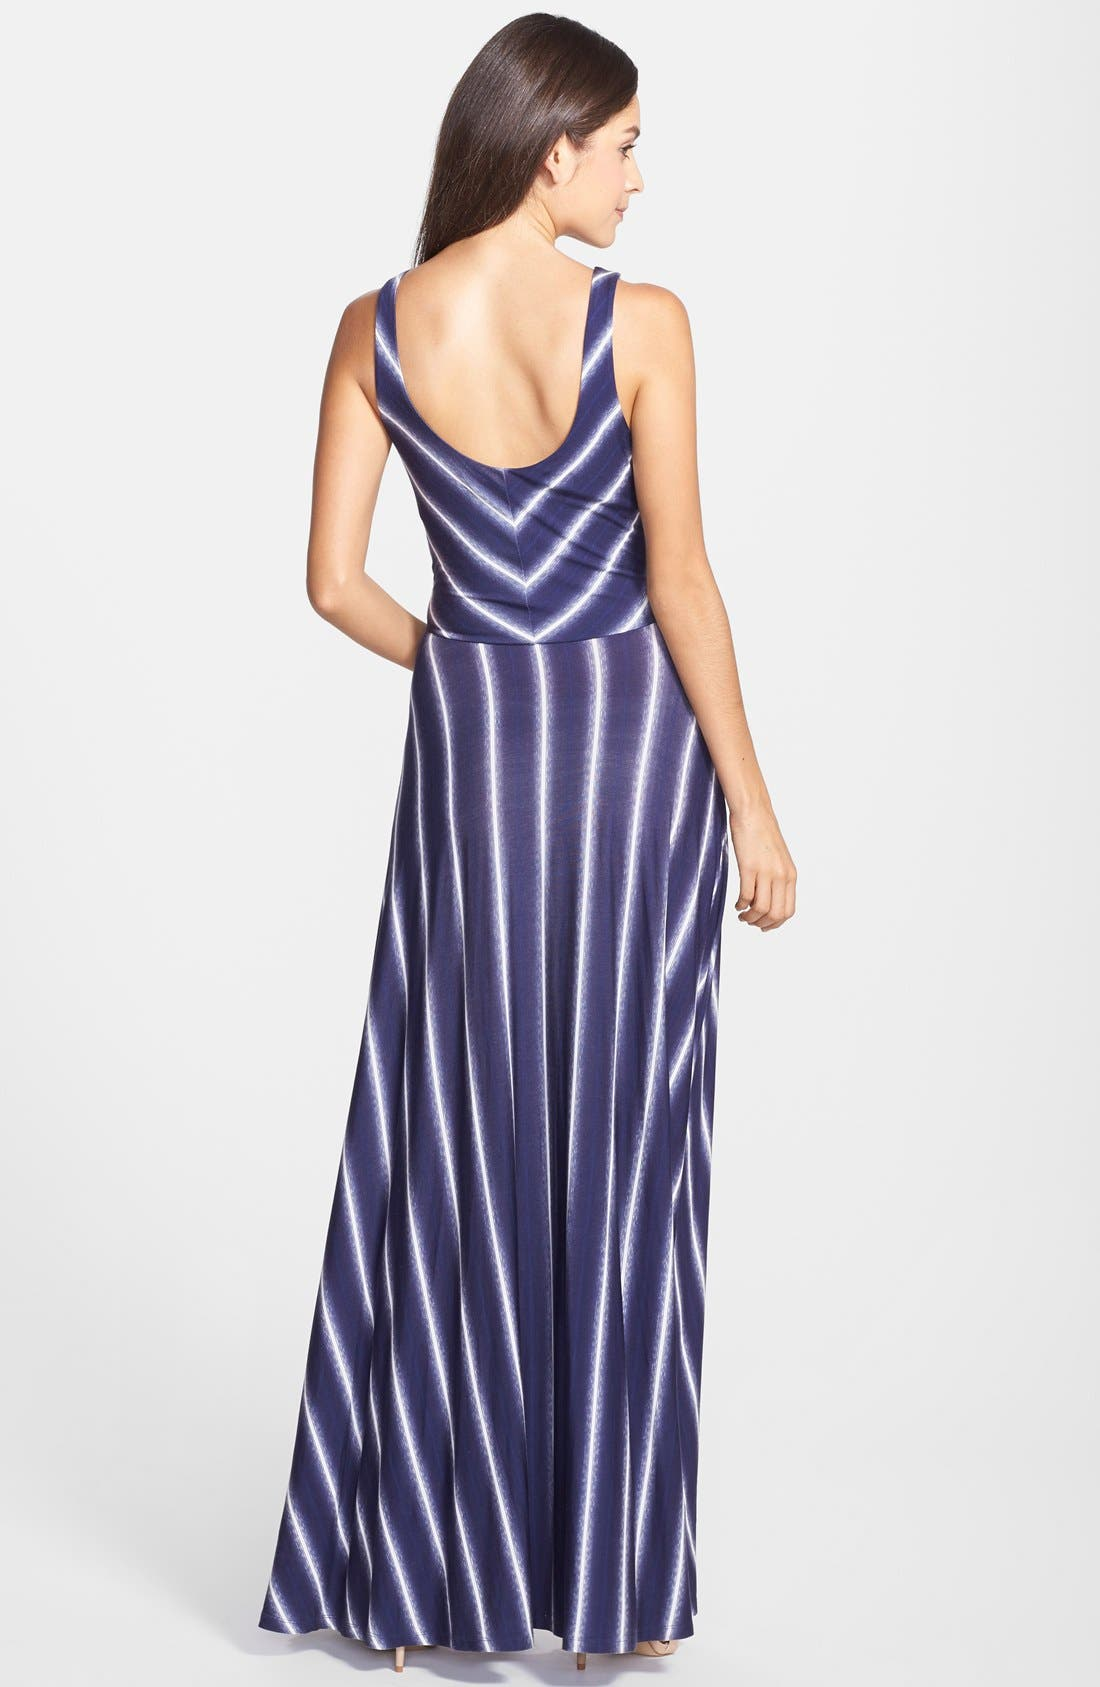 Stripe Scoop Neck Maxi Dress,                             Alternate thumbnail 2, color,                             429